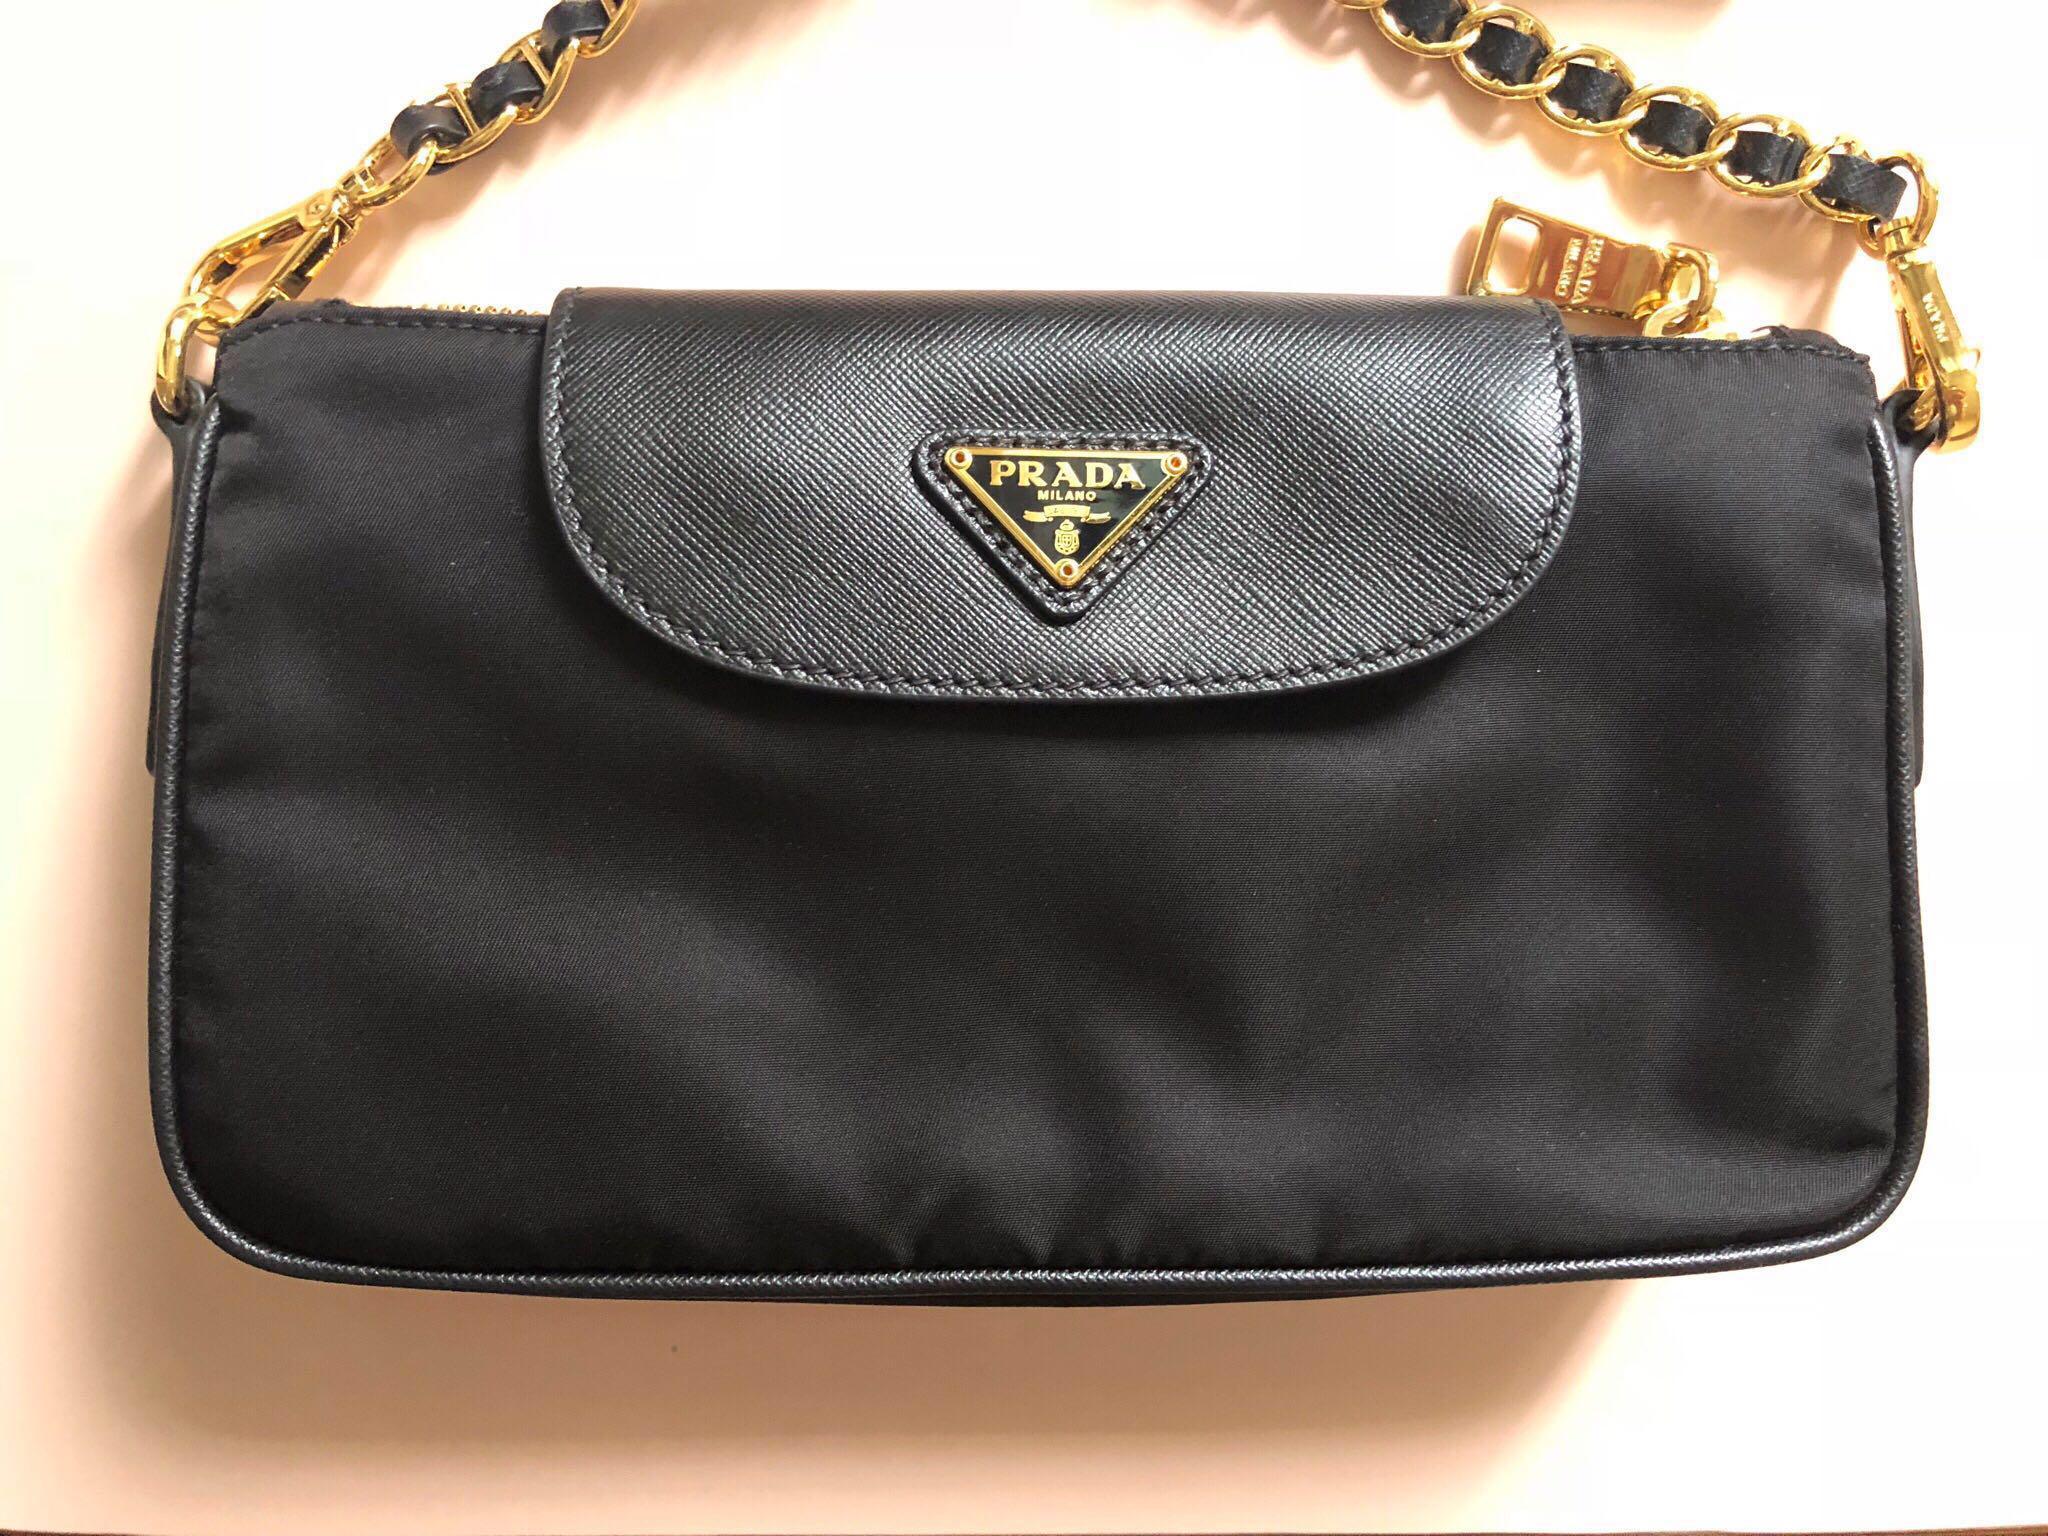 0e5b094ddd4 Prada Tessuto Saffiano Crossbody BT0779, Women's Fashion, Bags ...